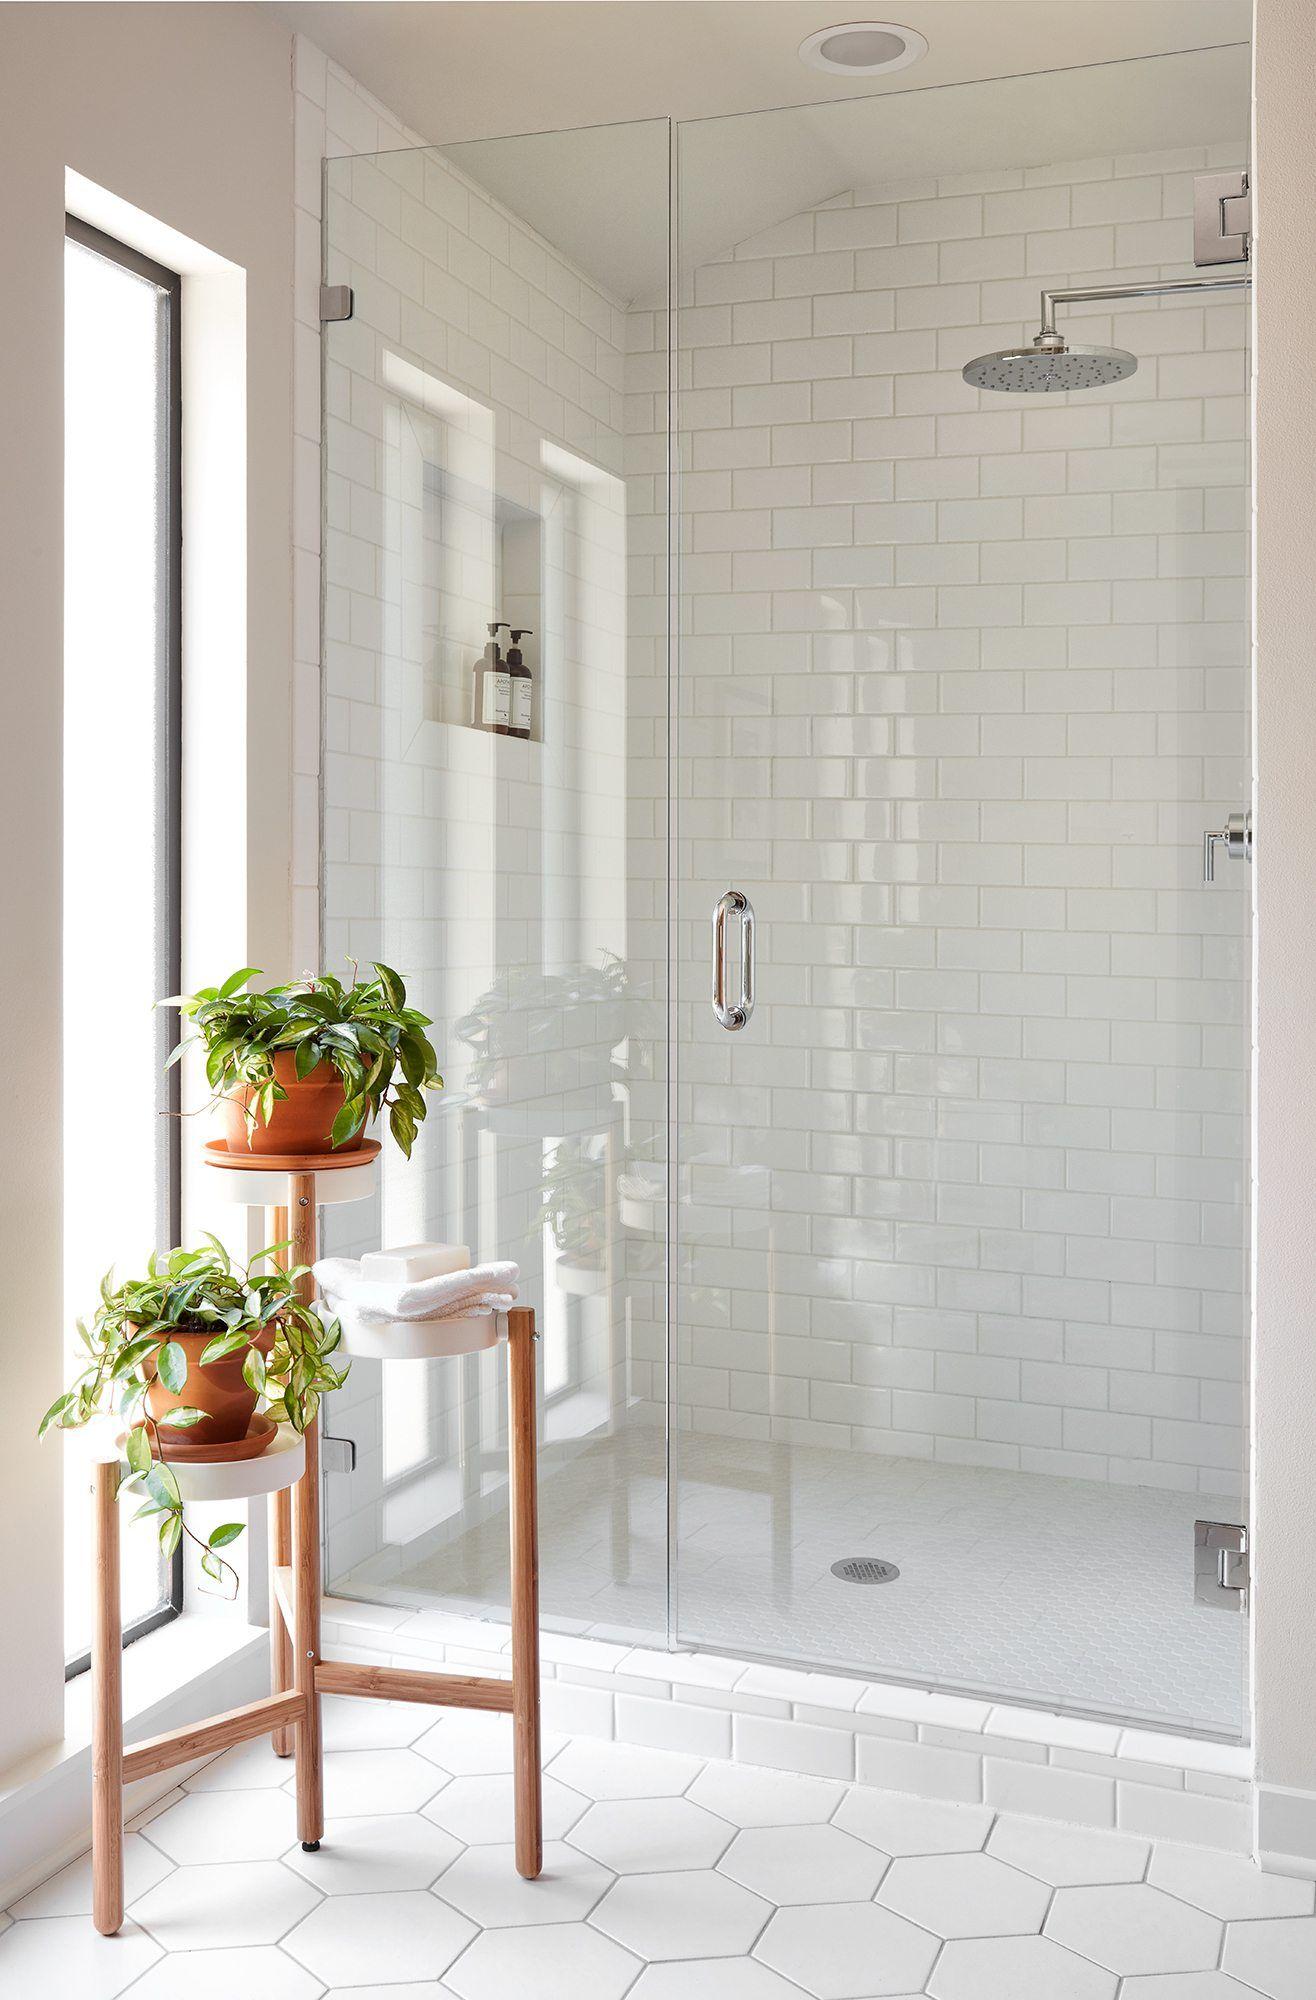 Episode 6 Season 5 Hgtv S Fixer Upper Chip Jo Gaines Master Bathroom Design Bathroom Remodel Master Bathroom Tile Designs